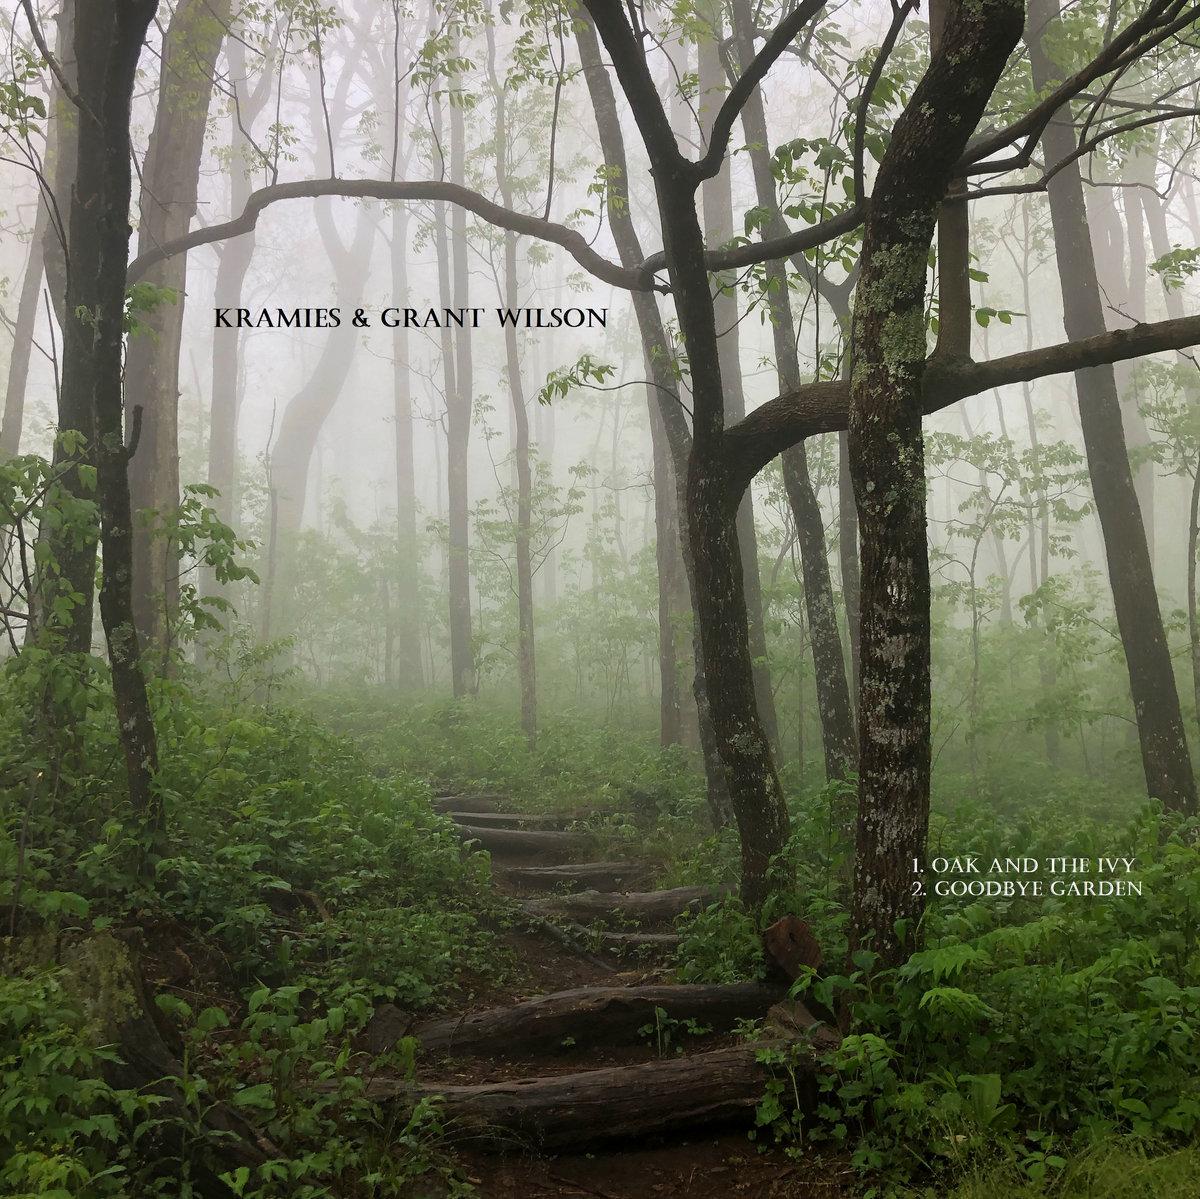 Kramies & Grant Wilson – Oak and the Ivy/Goodbye Garden